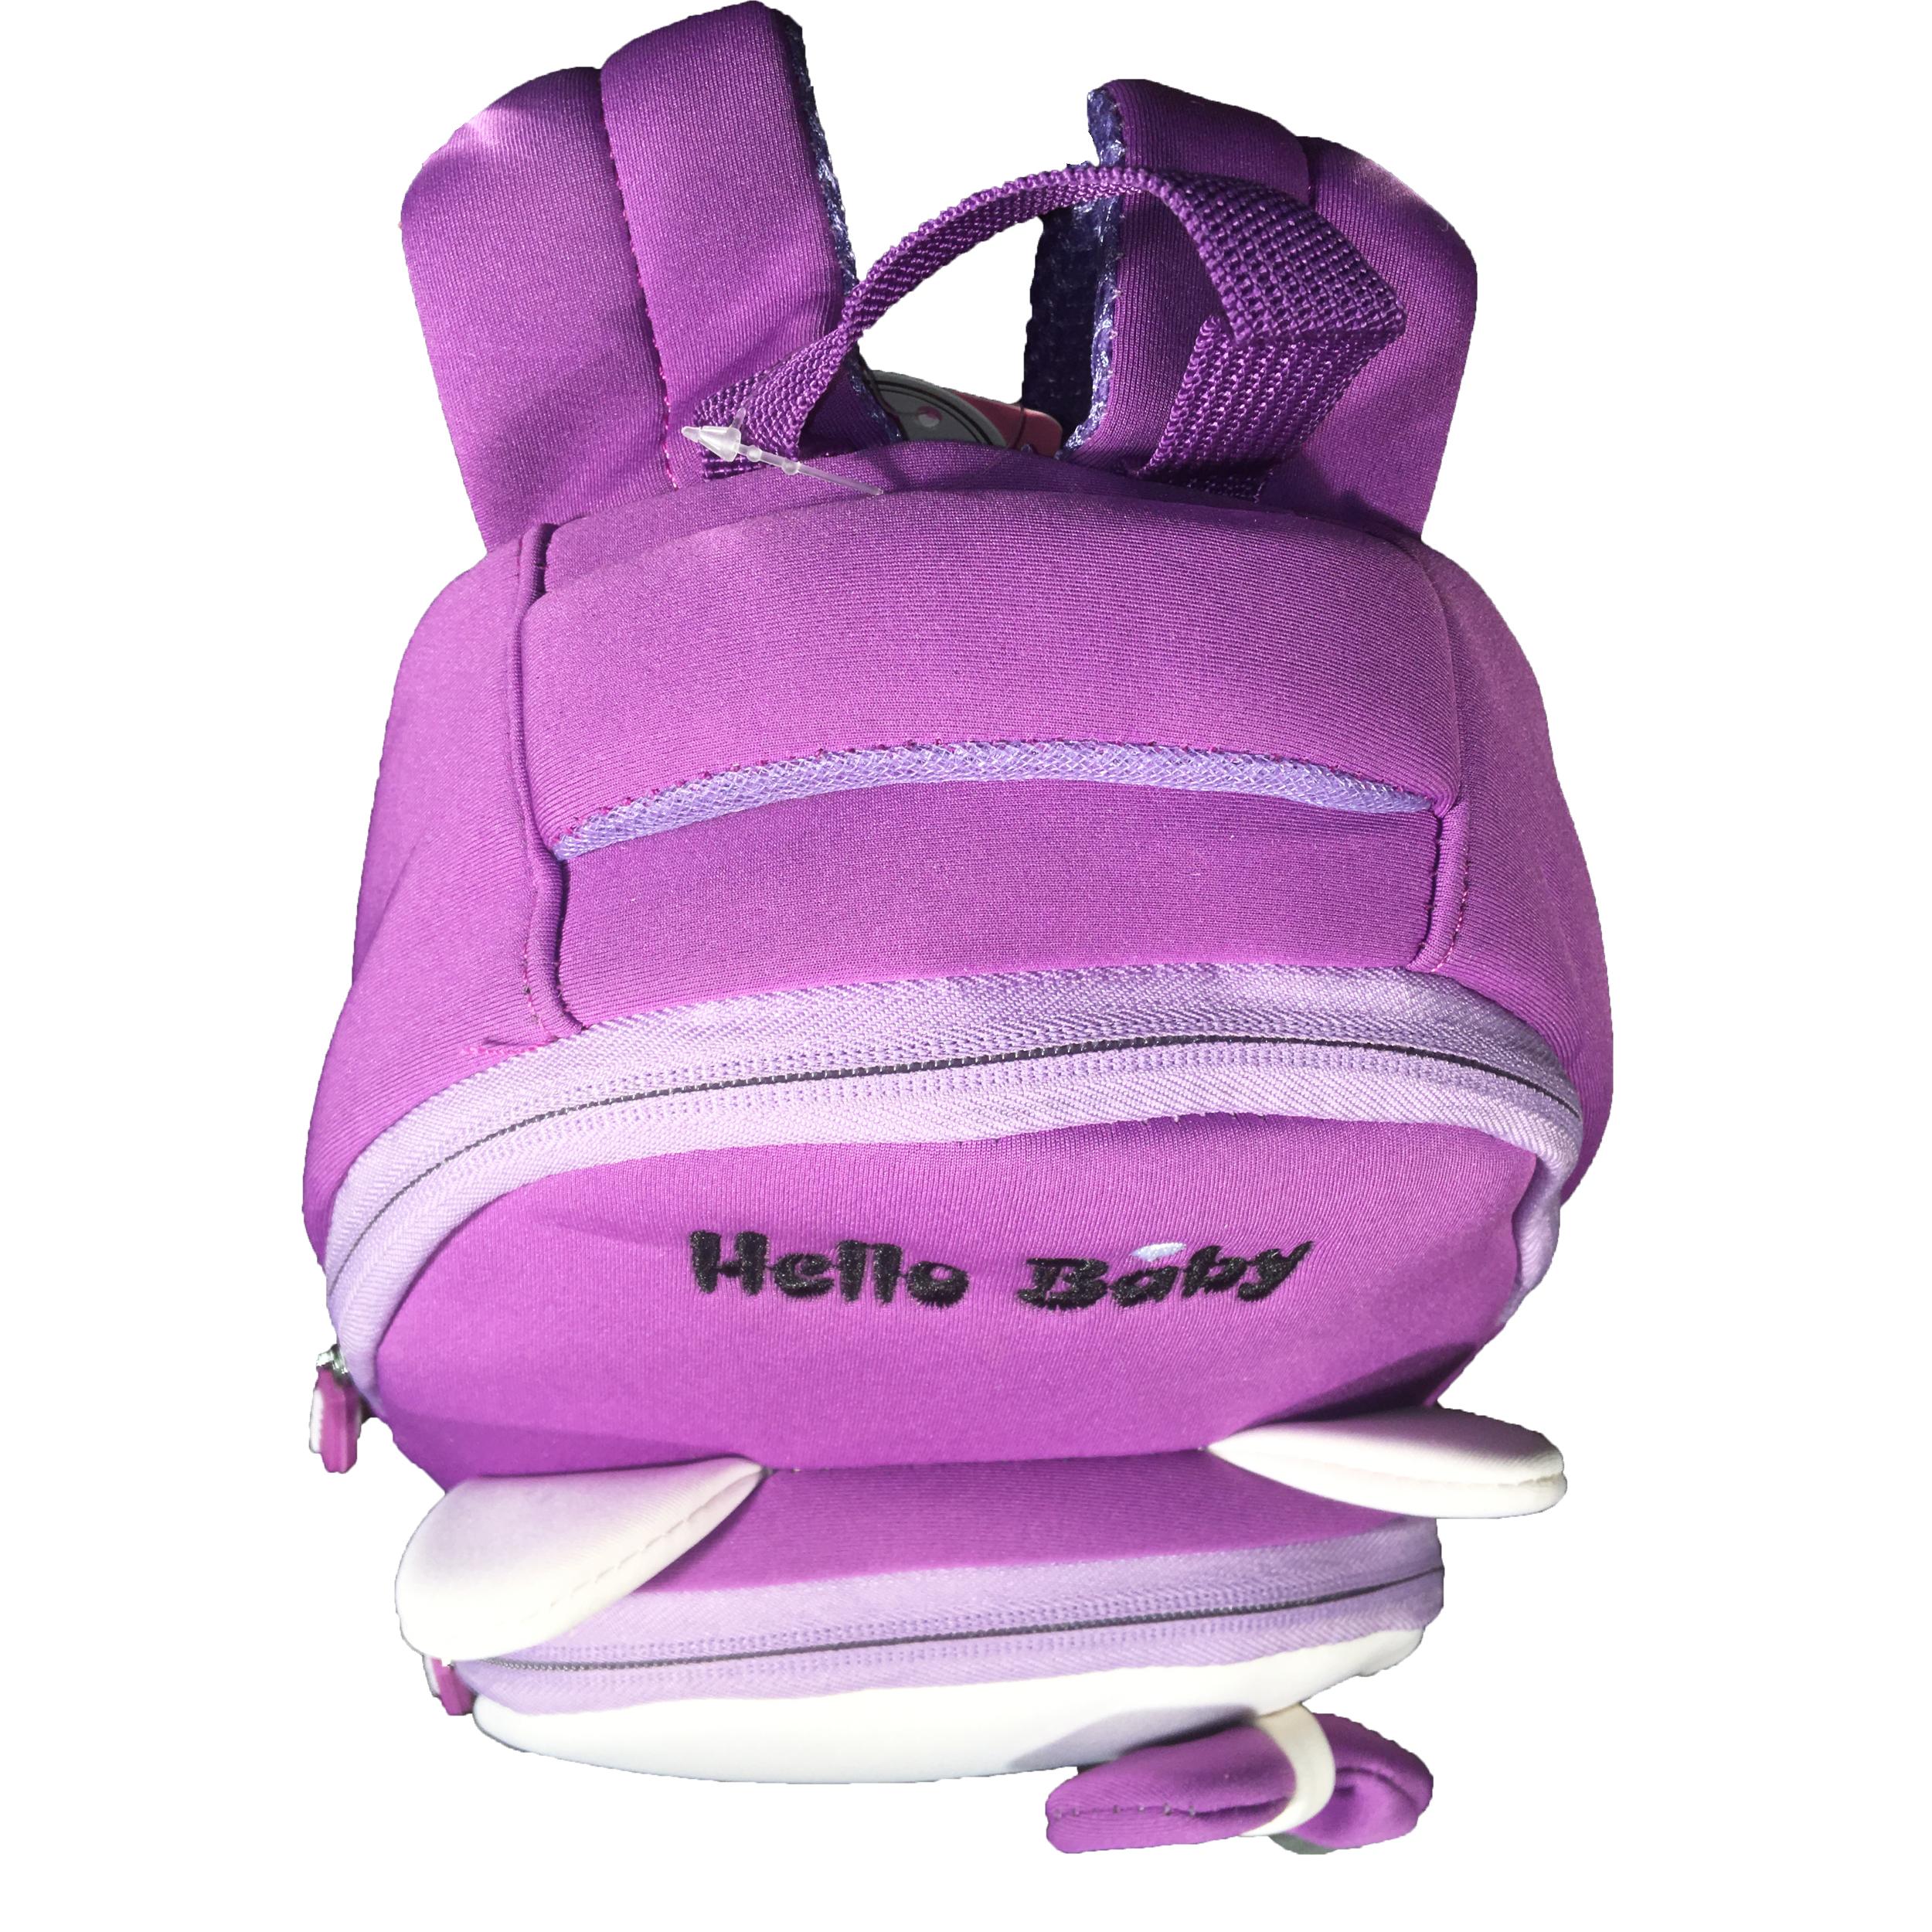 کوله پشتی دخترانه هلو بیبی کد adll3 -  - 11